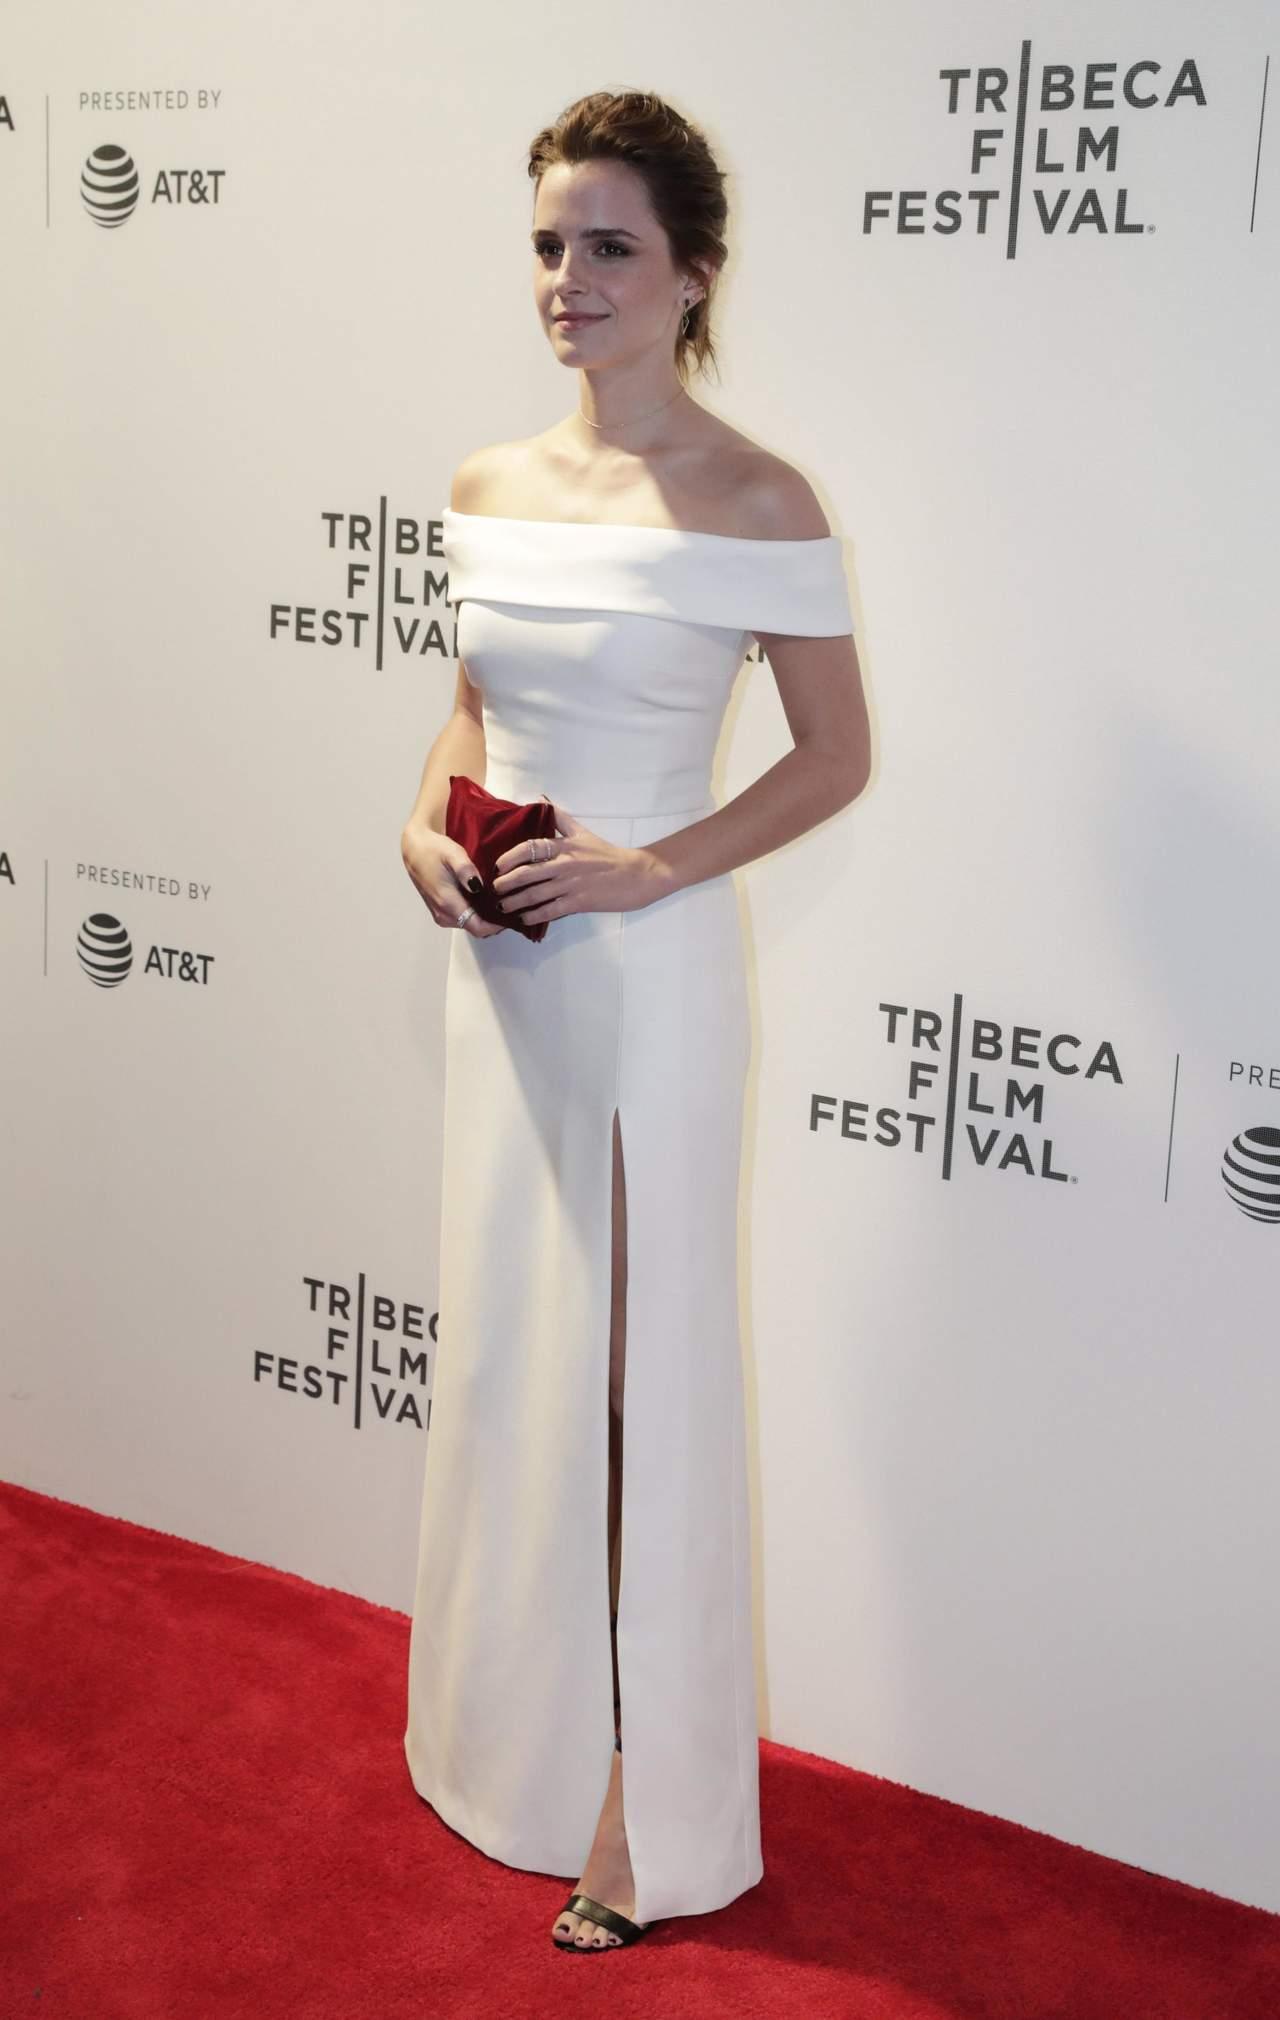 Emma De Cine En TribecaEl Siglo Watson Robó Miradas Festival PuTOkXwZi